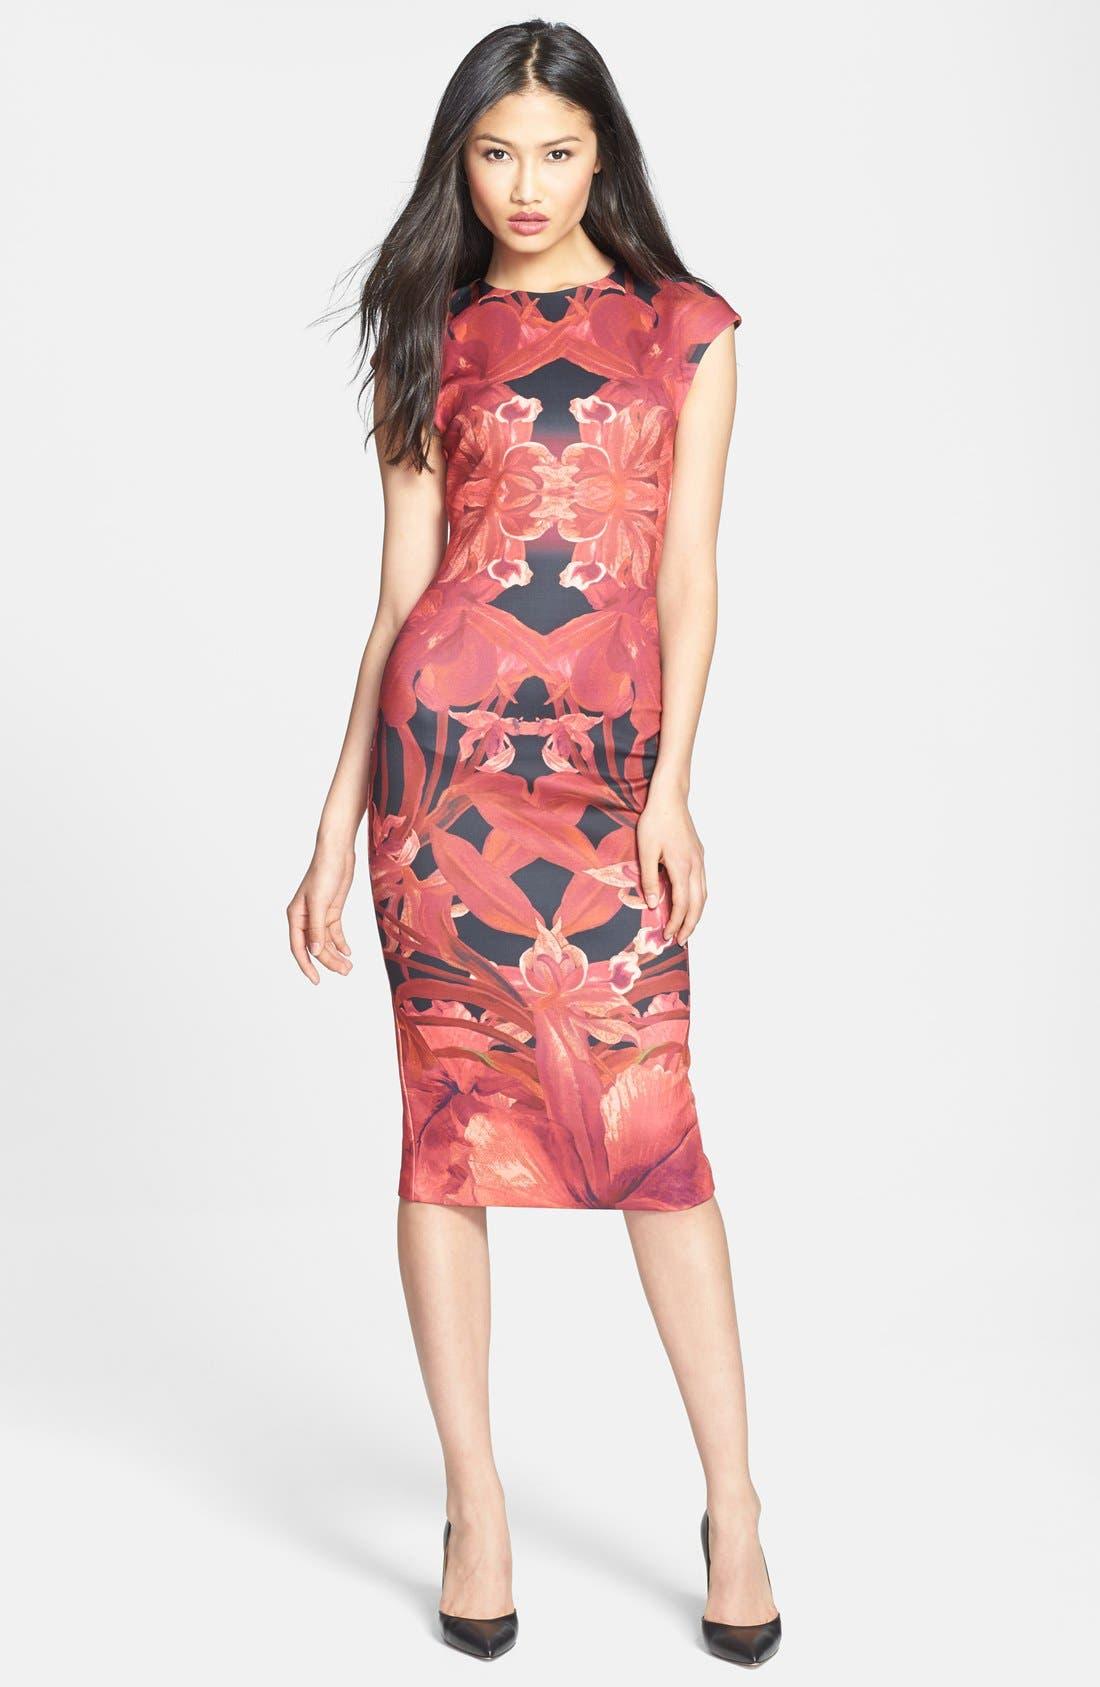 Alternate Image 1 Selected - Ted Baker London 'Jungle Orchid' Print Neoprene Midi Dress